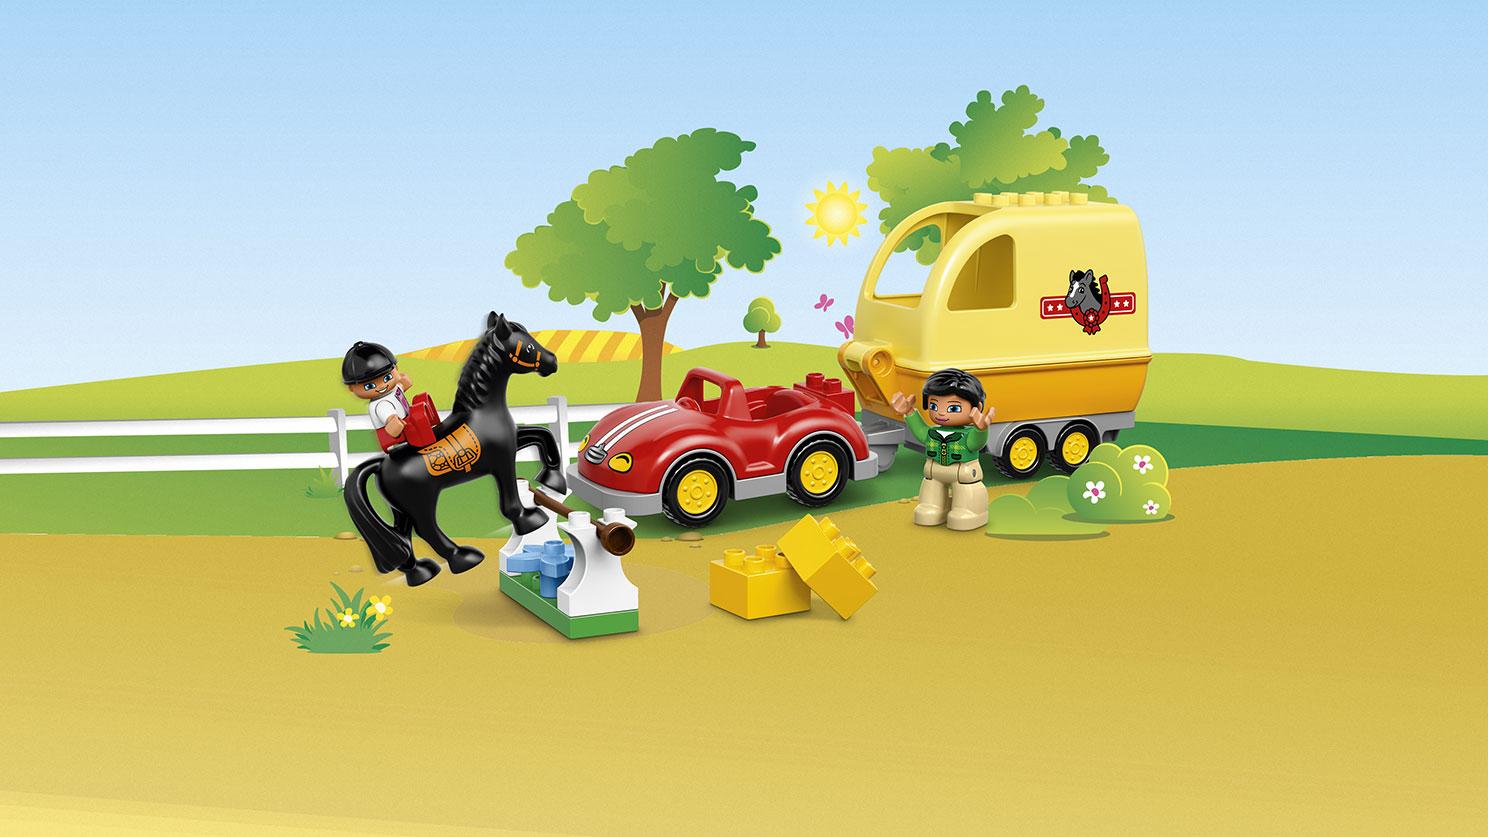 LEGO DUPLO 10807 La remorque à chevaux  Lego Duplo  Lego  Construction